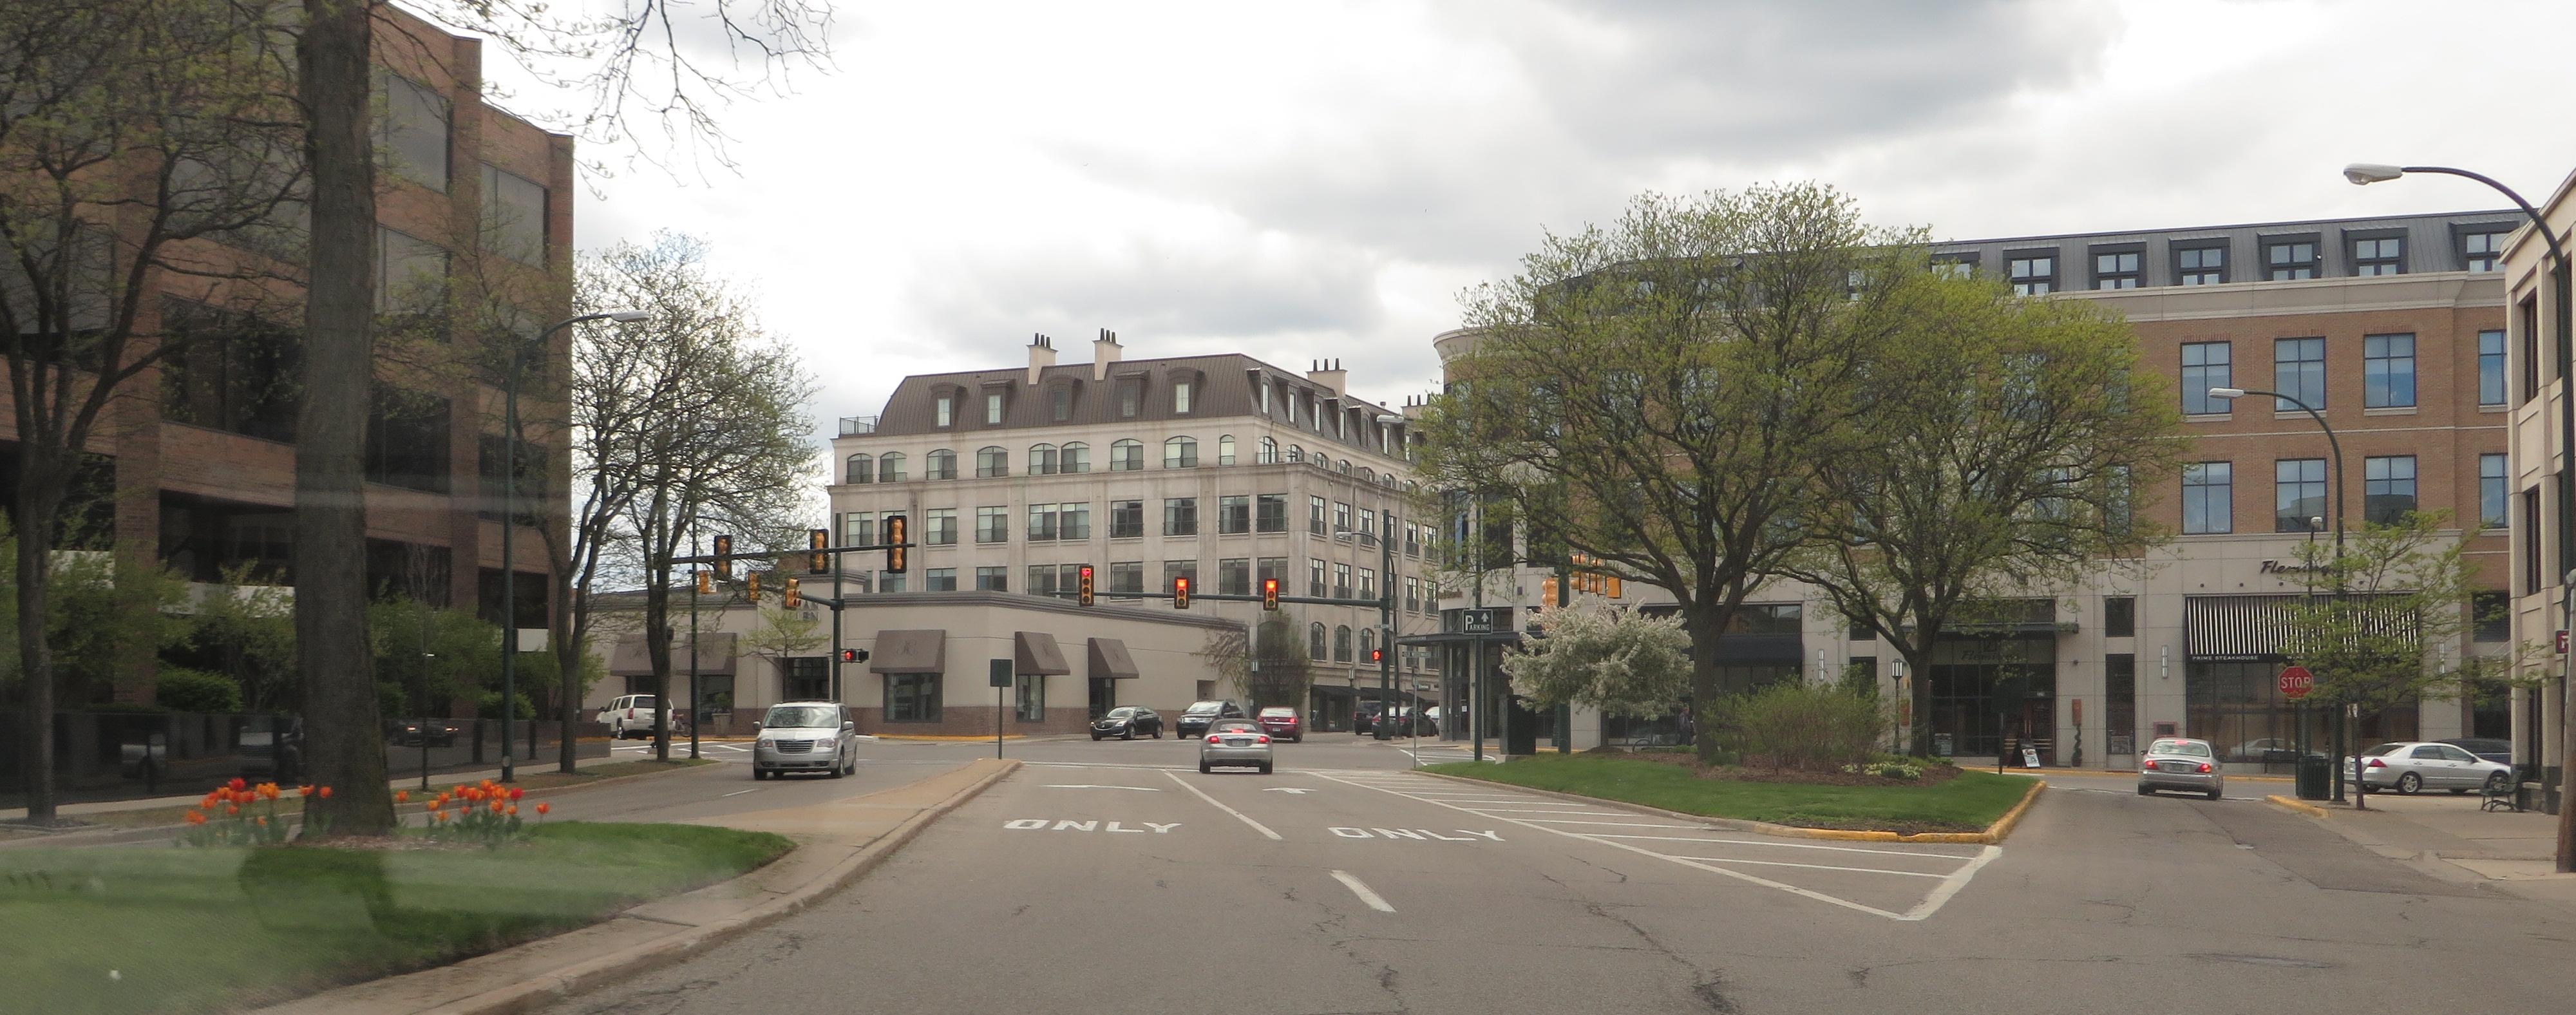 Restaurants In Downtown Birmingham Michigan